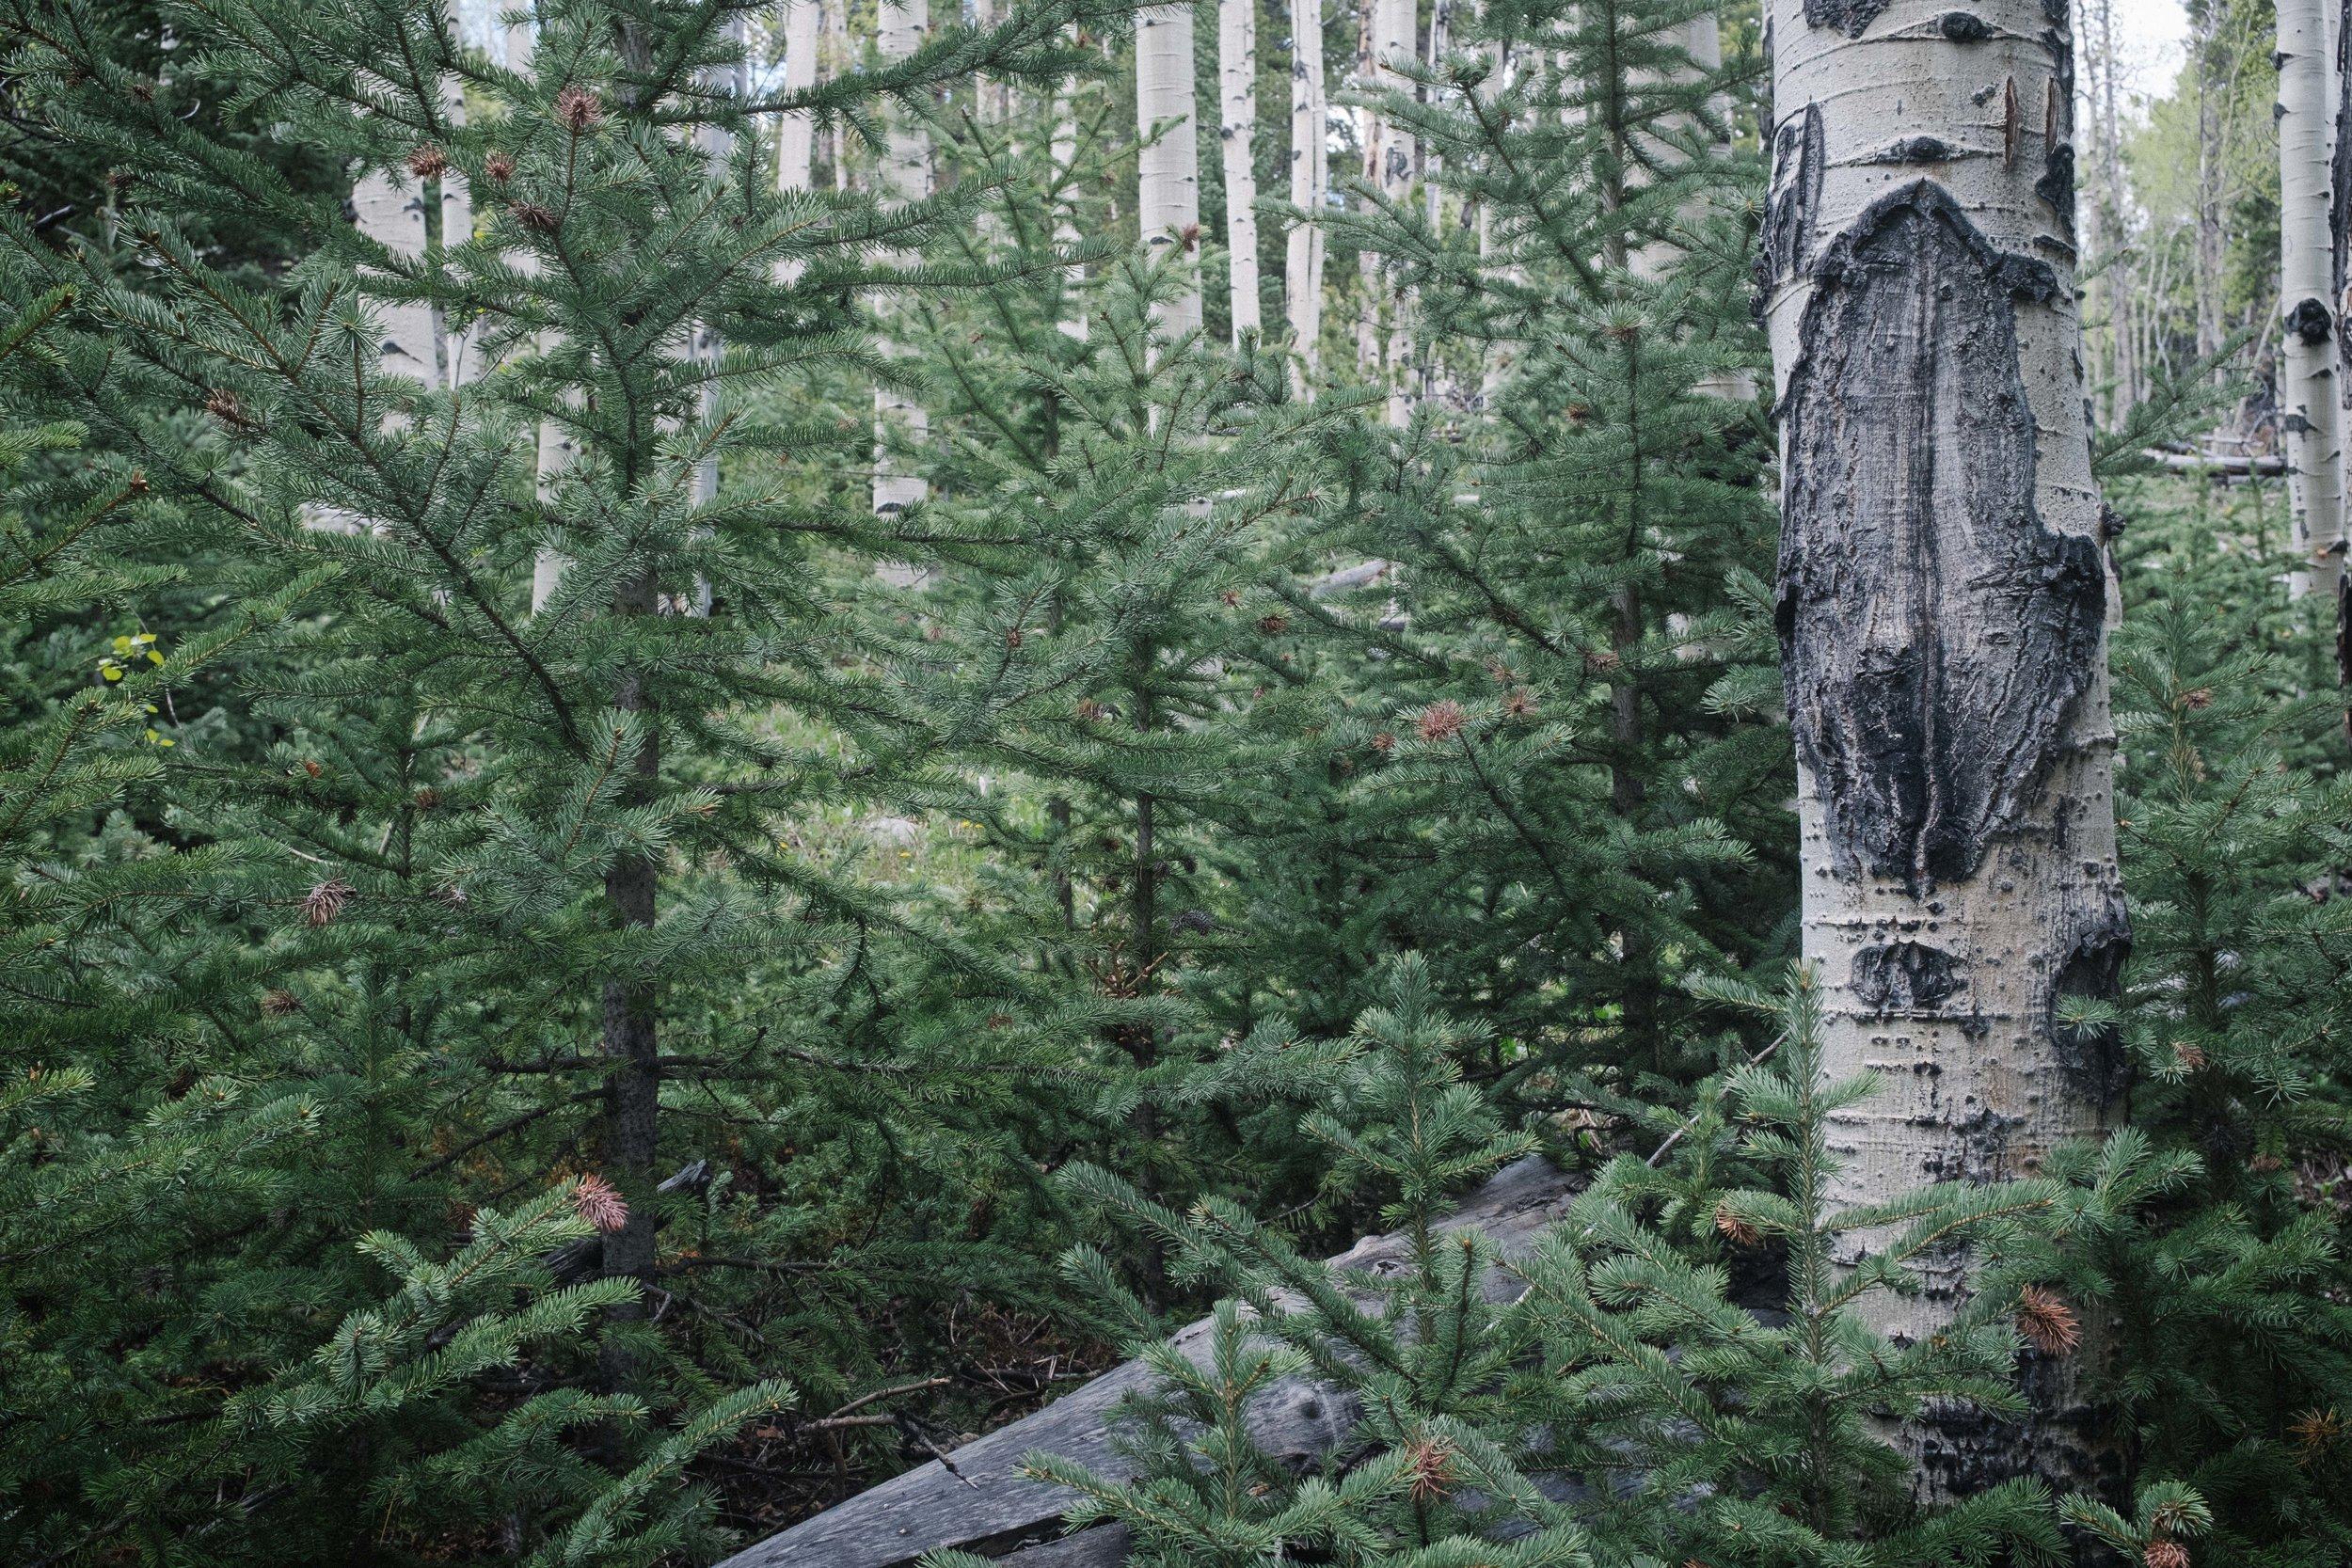 Aspen among the Pines